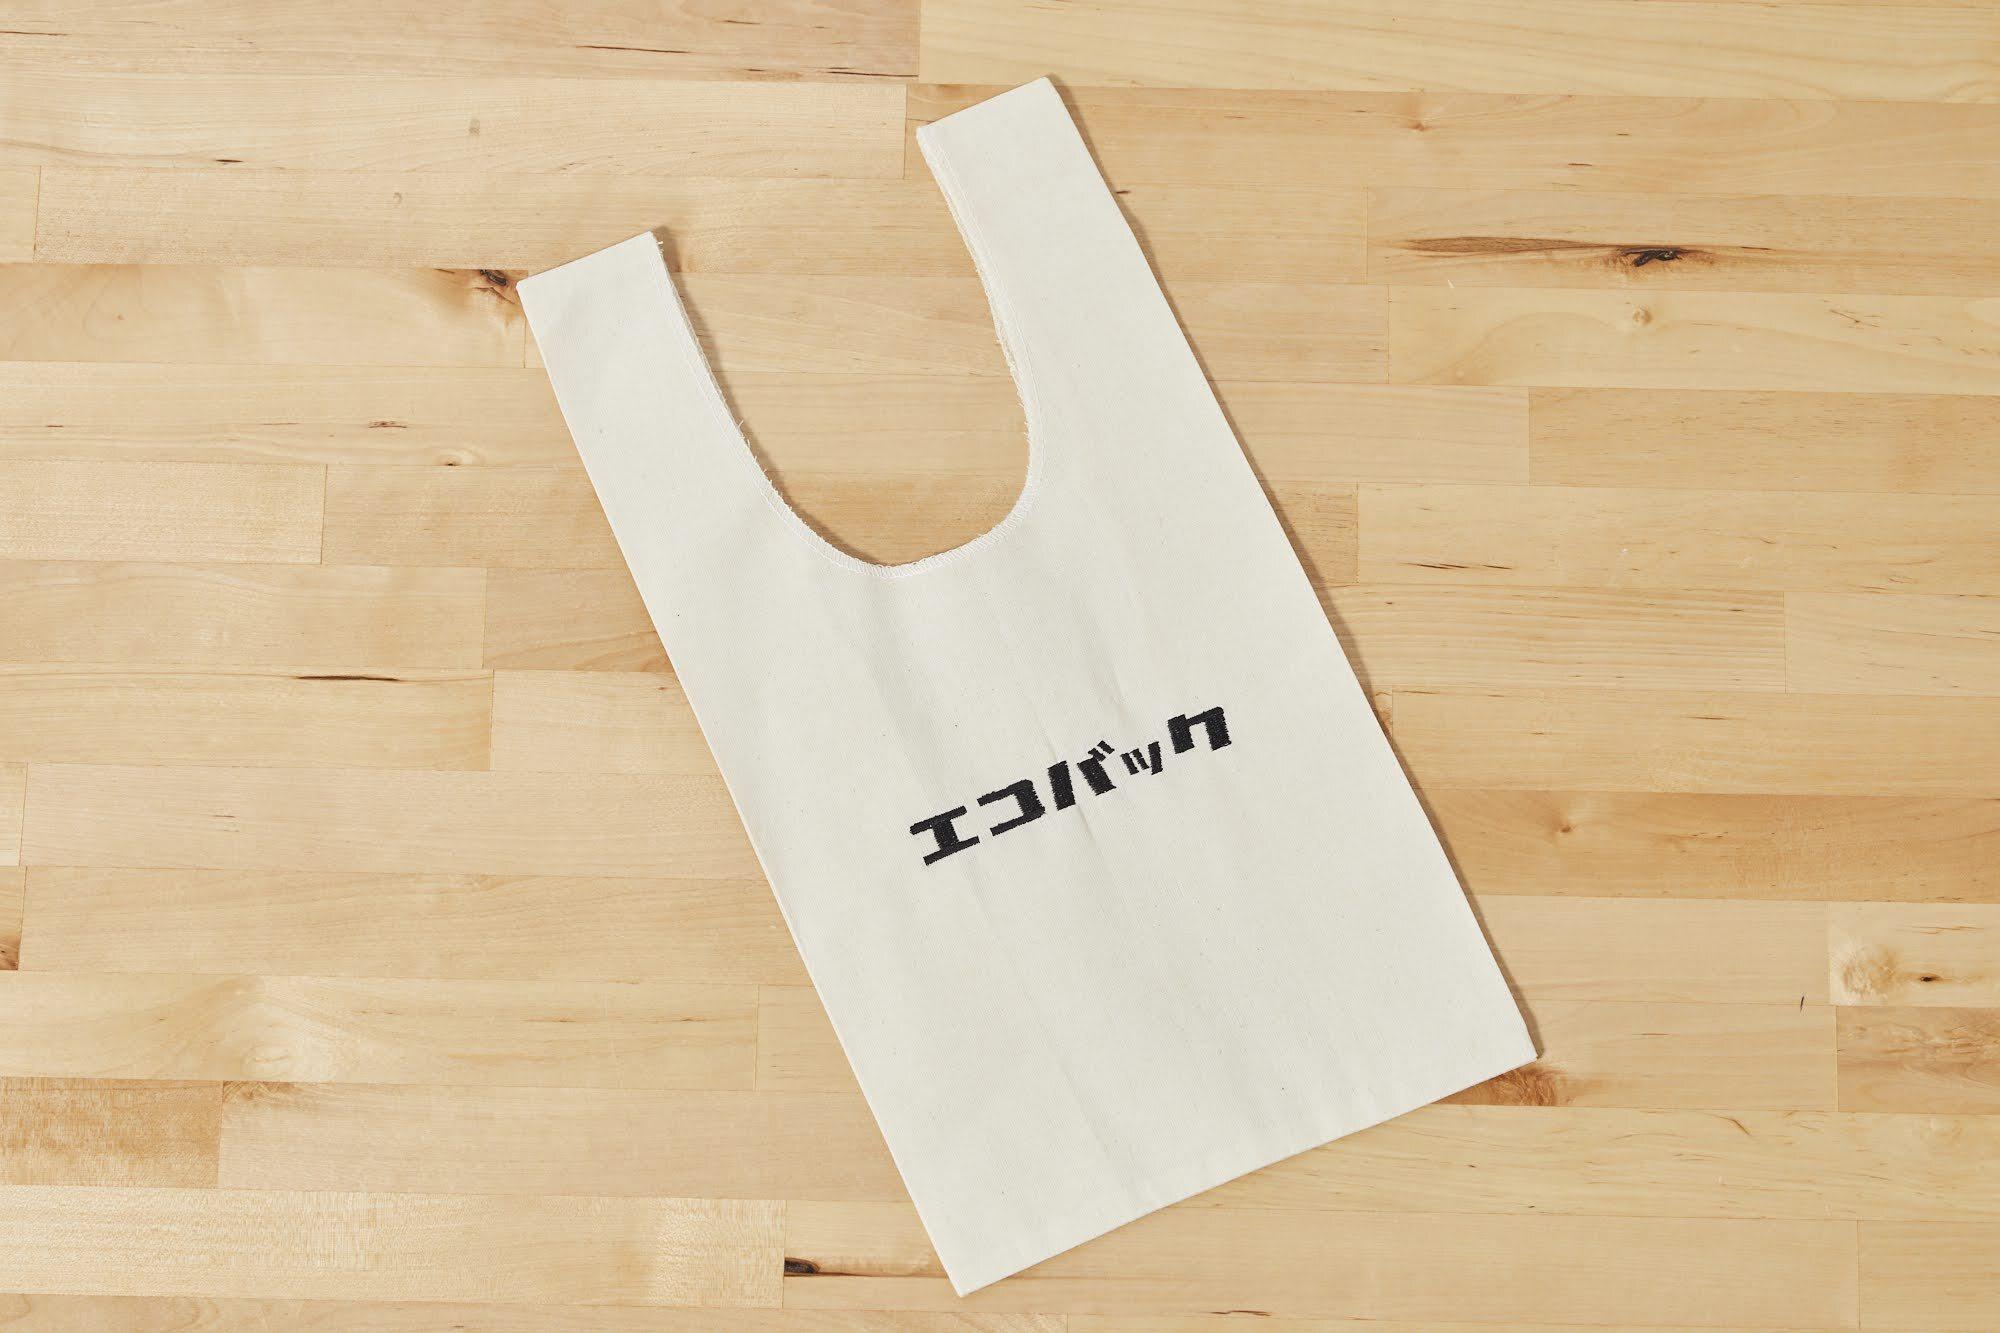 《 Sサイズ 》刺繍のマルシェバック エコバック/レジ袋